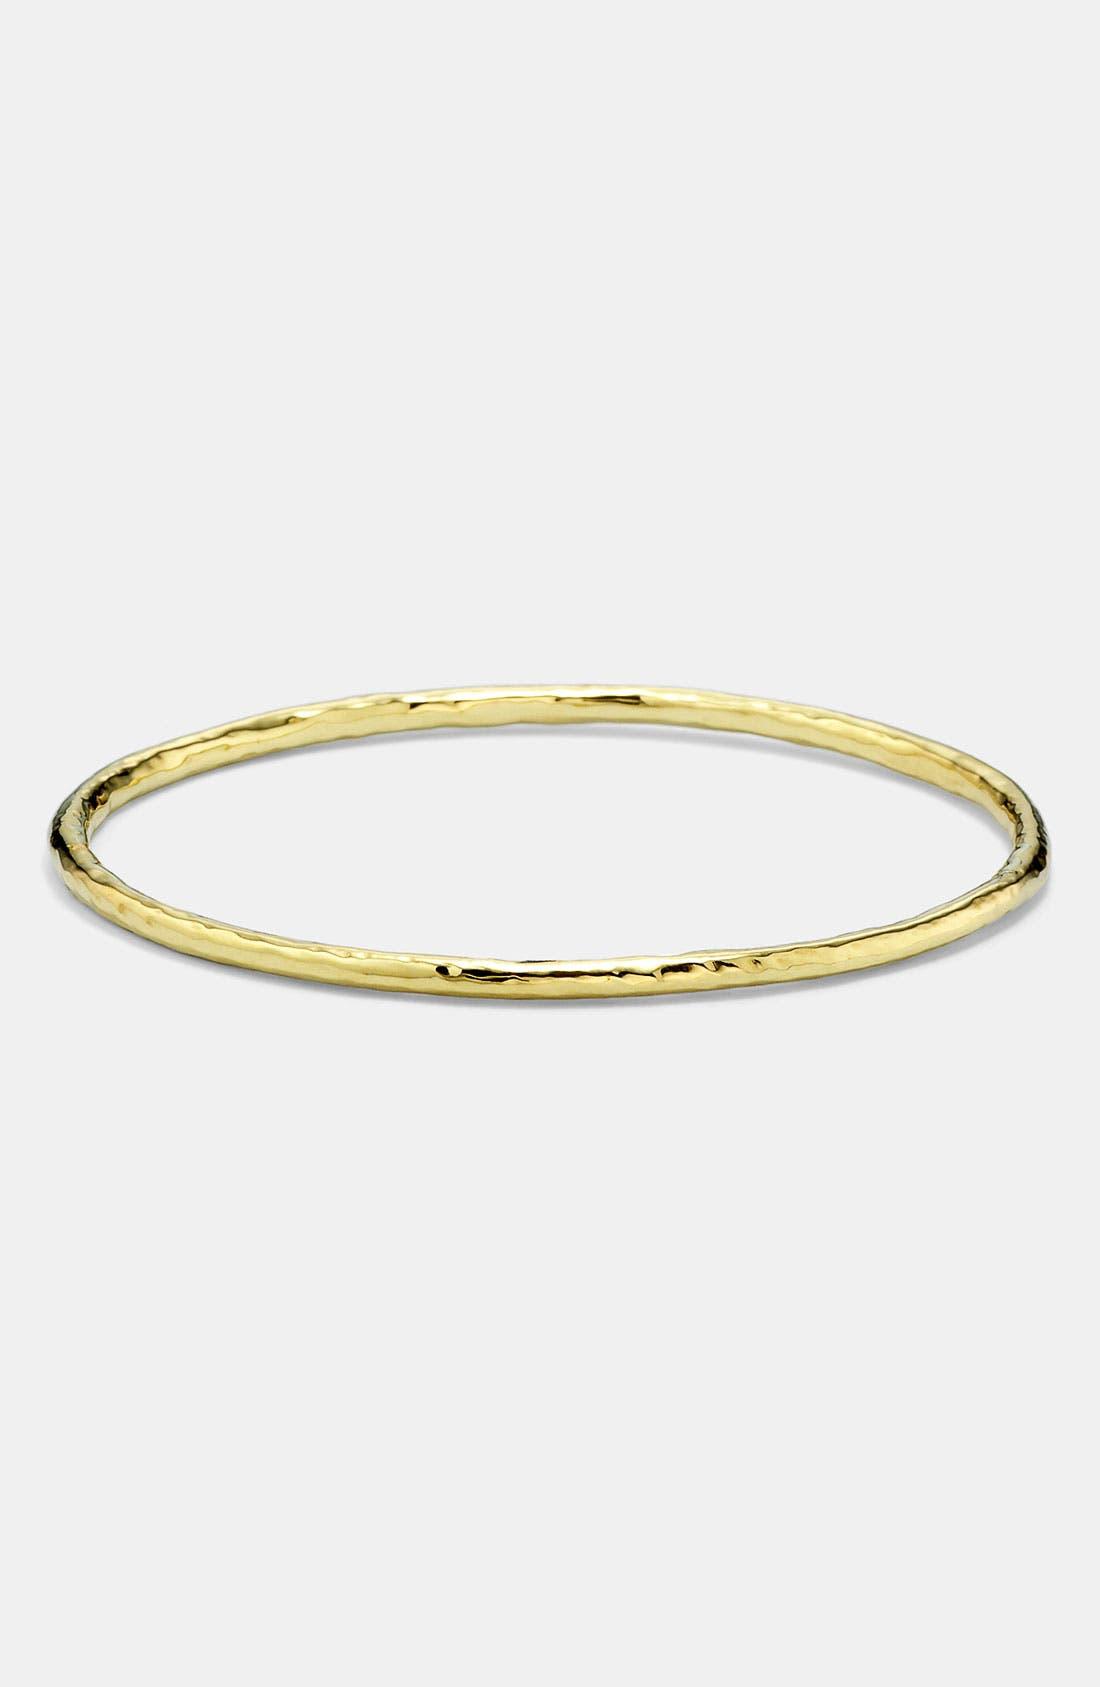 Alternate Image 1 Selected - Ippolita 'Glamazon' 18k Gold Bangle